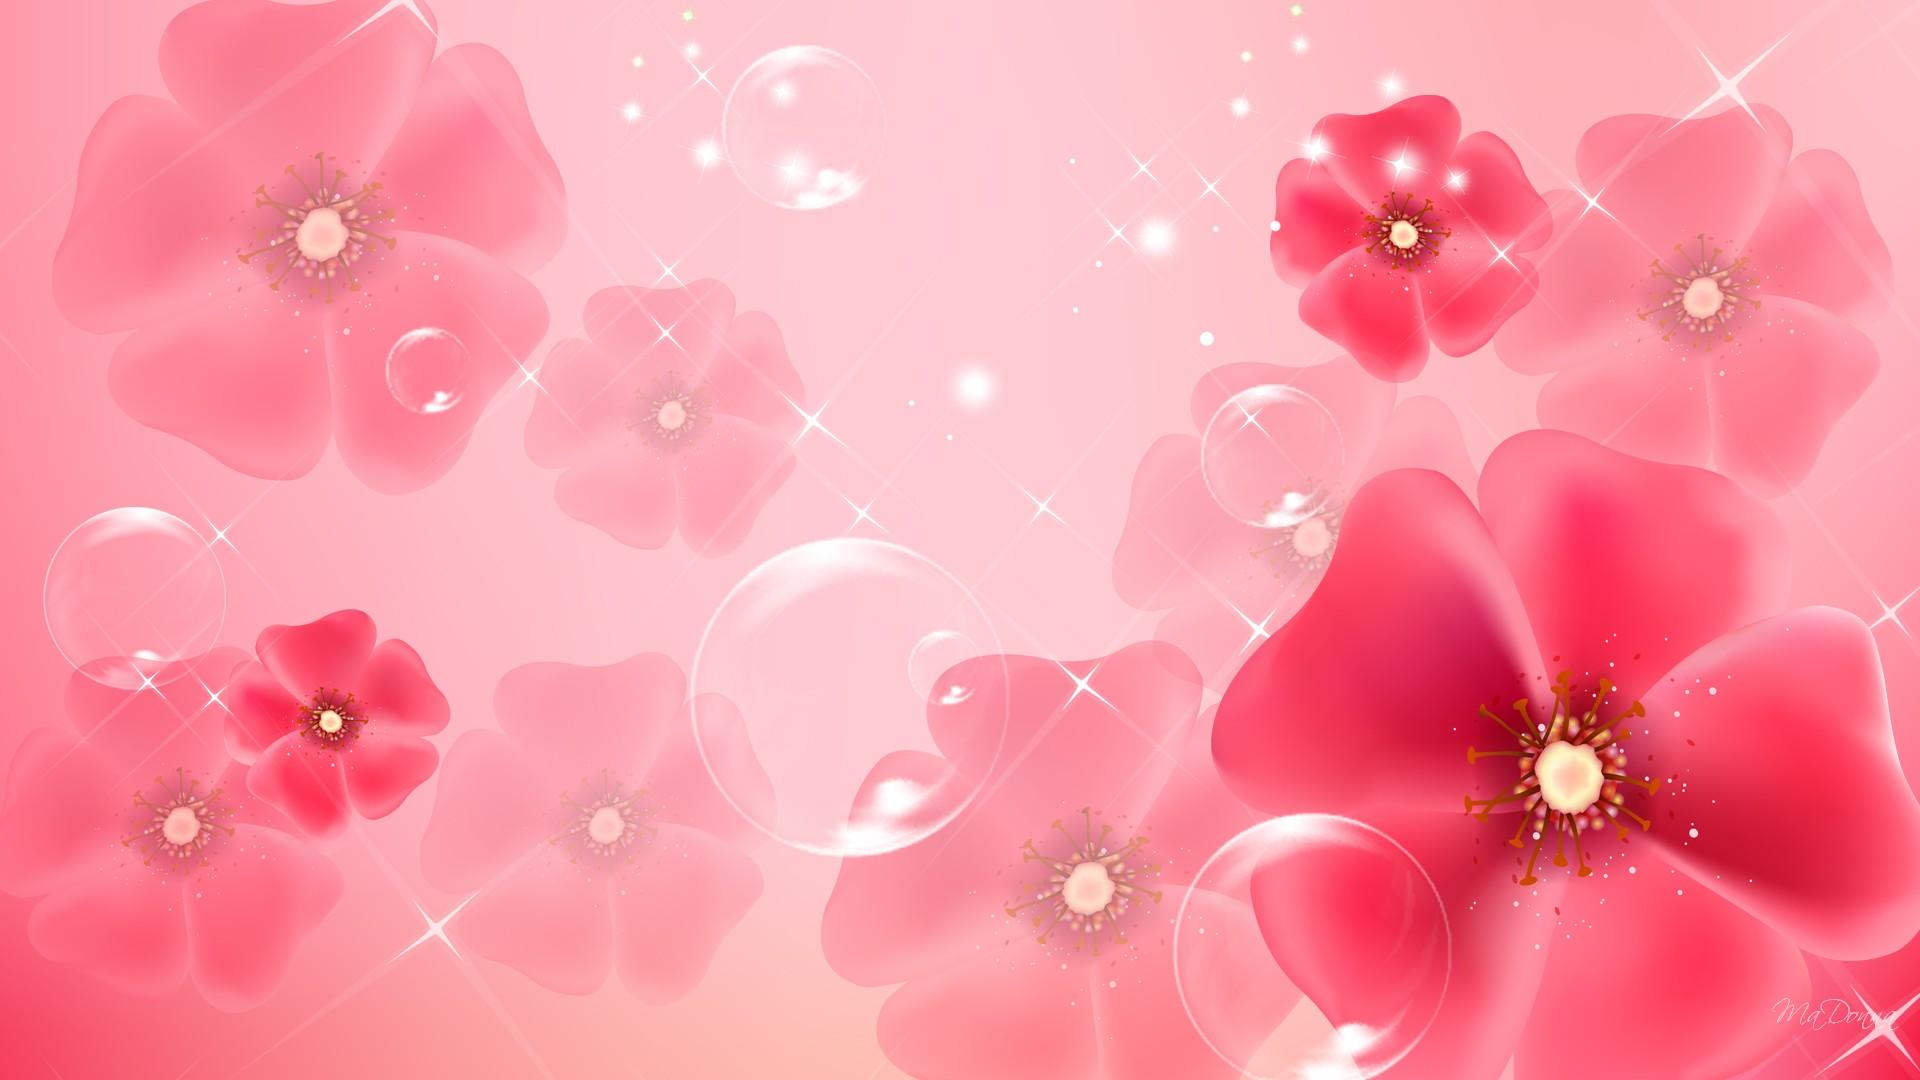 Light Pink Wallpapers   Desktop Backgrounds 1920x1080